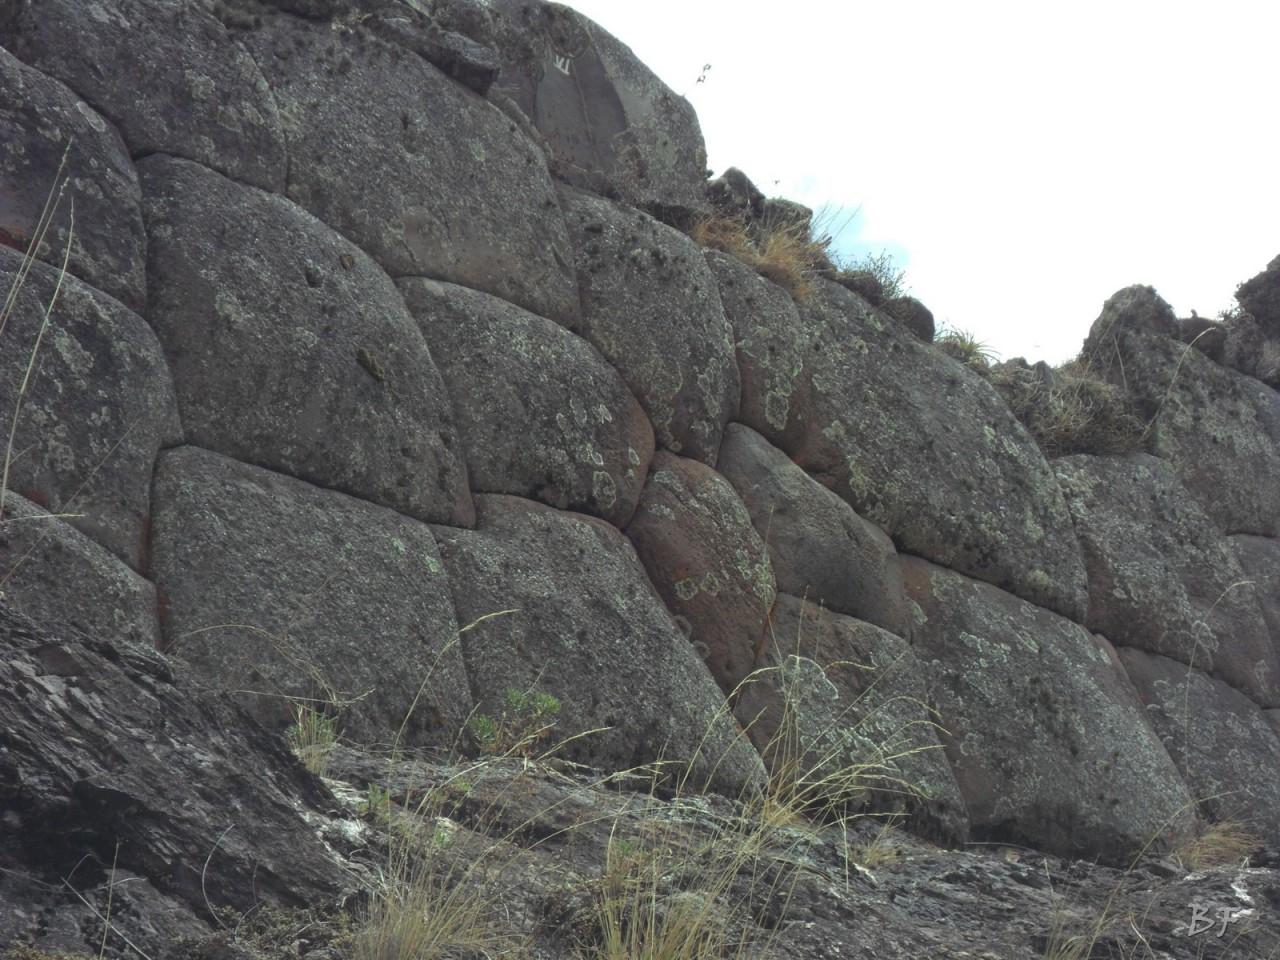 Mura-Poligonali-Megaliti-Altari-Rupestri-Pisac-Cusco-Perù-27